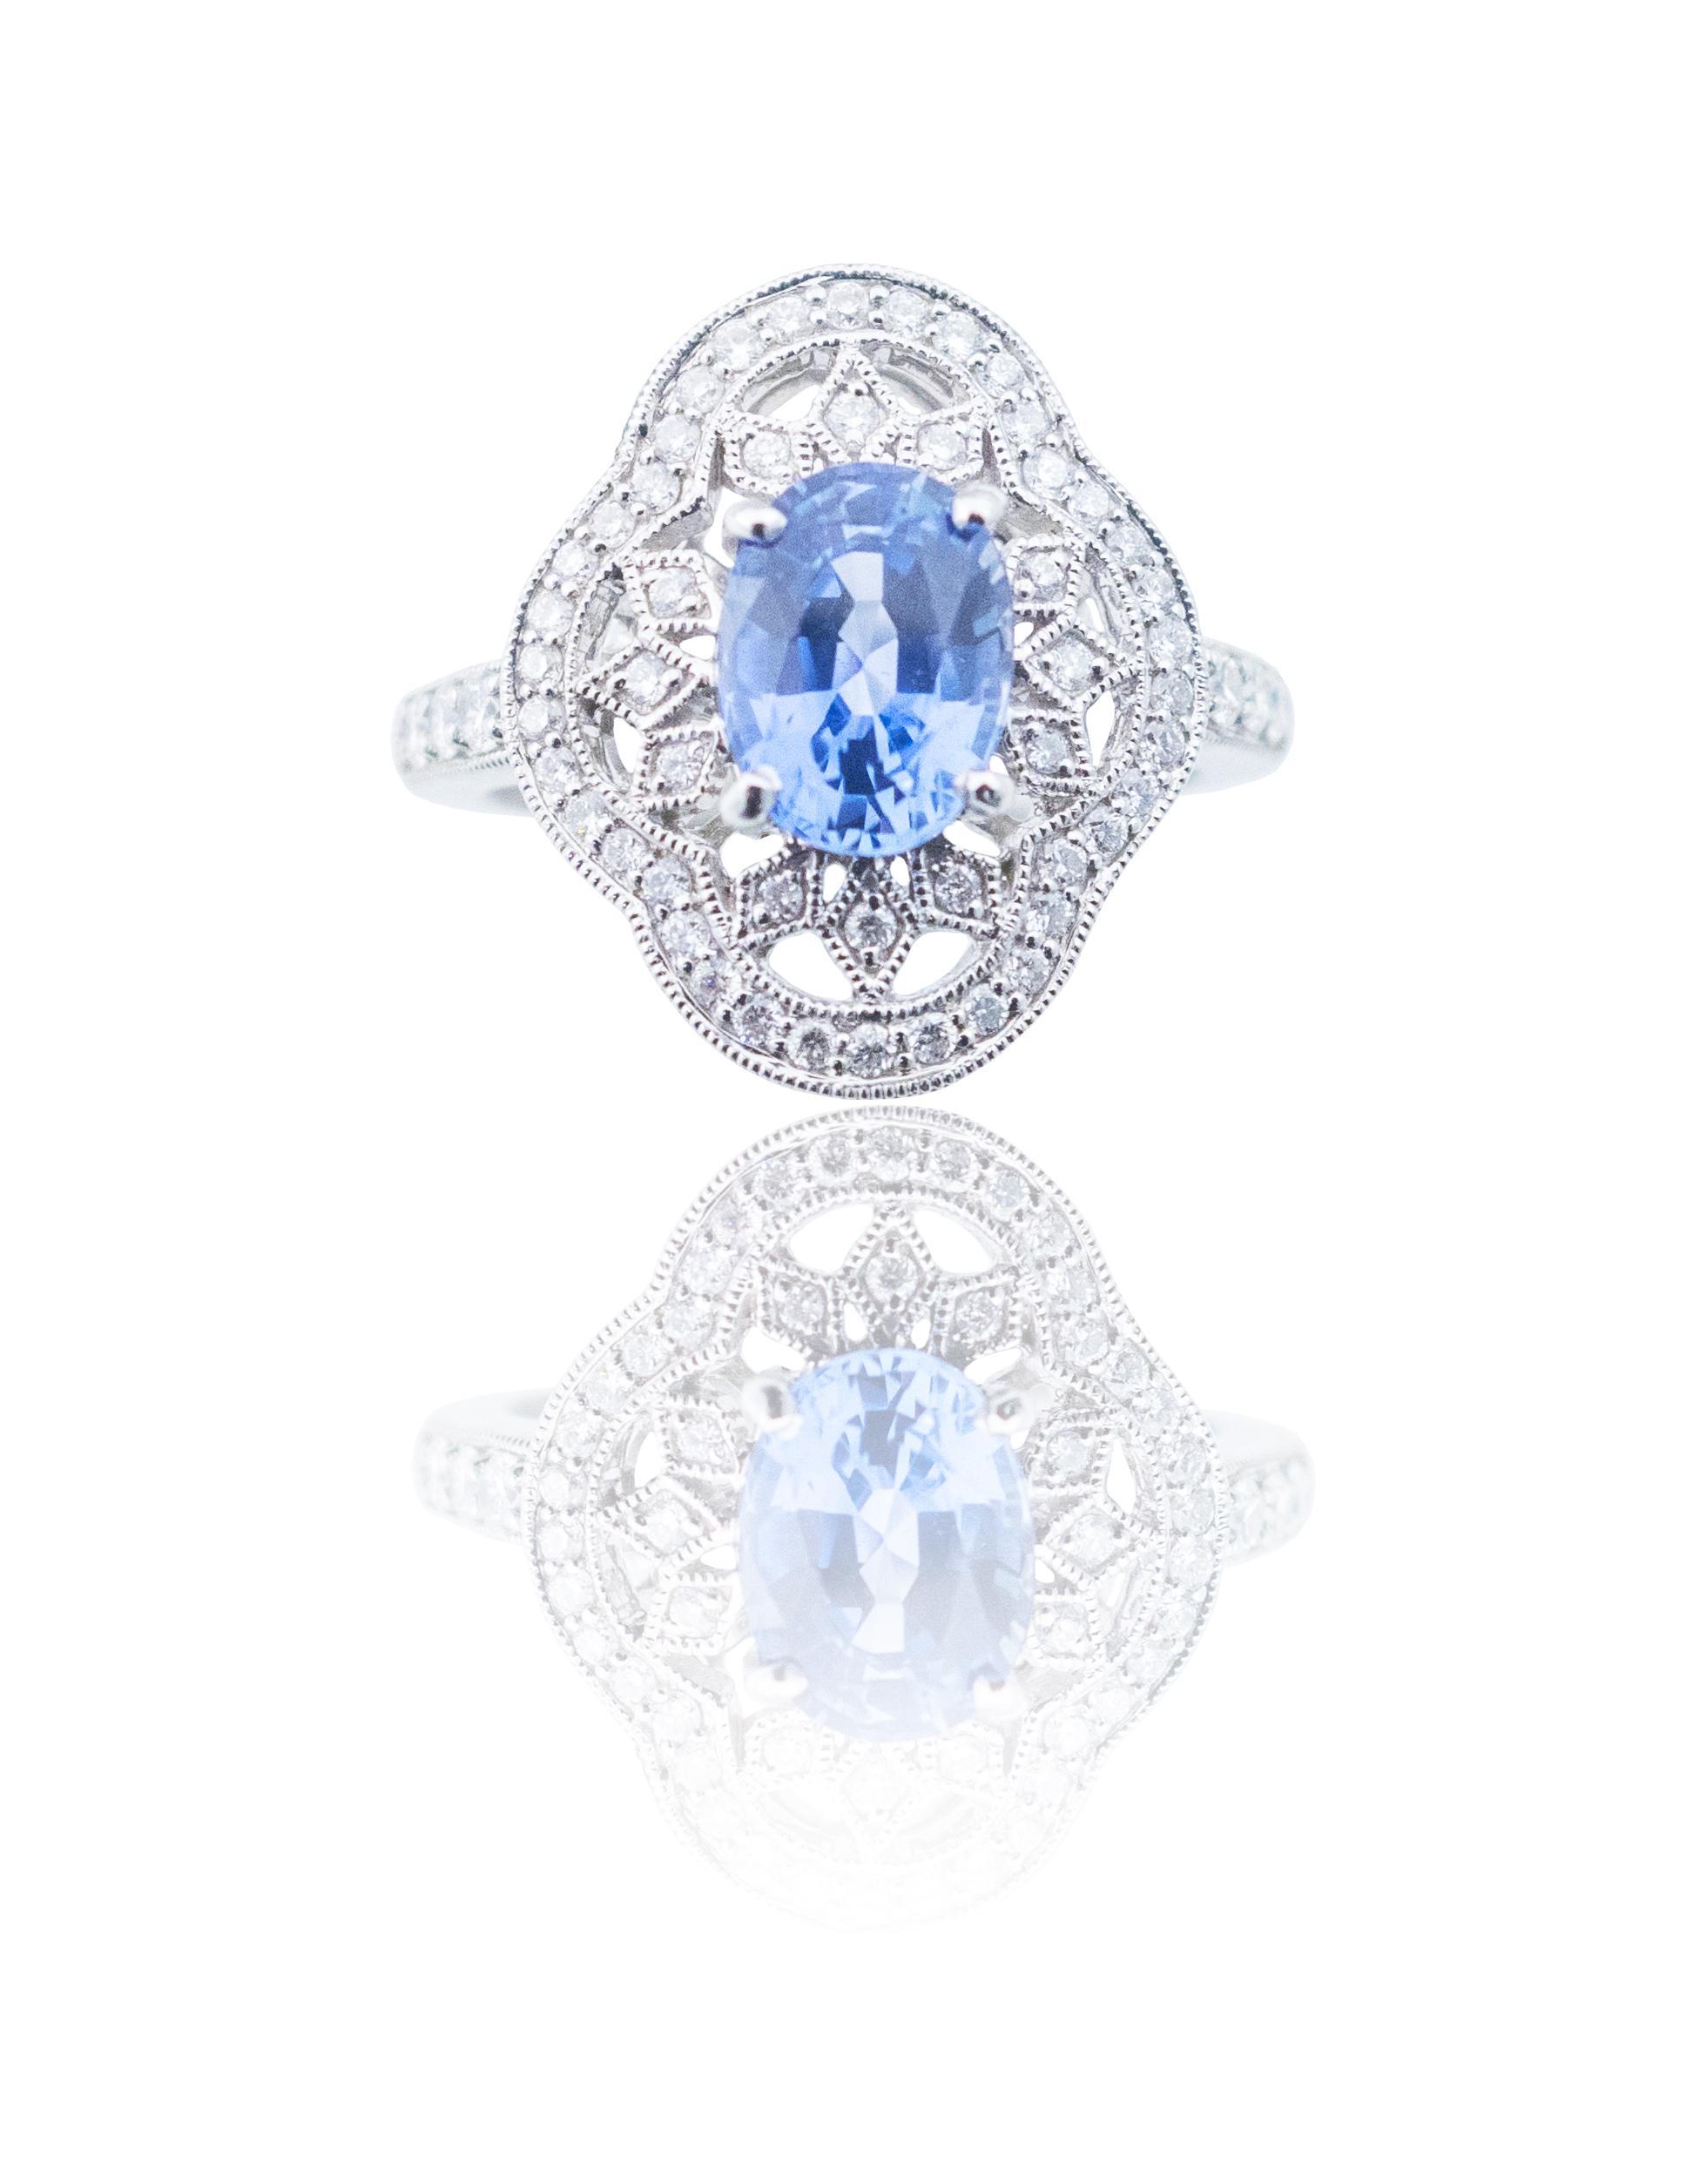 Sapphire ring!